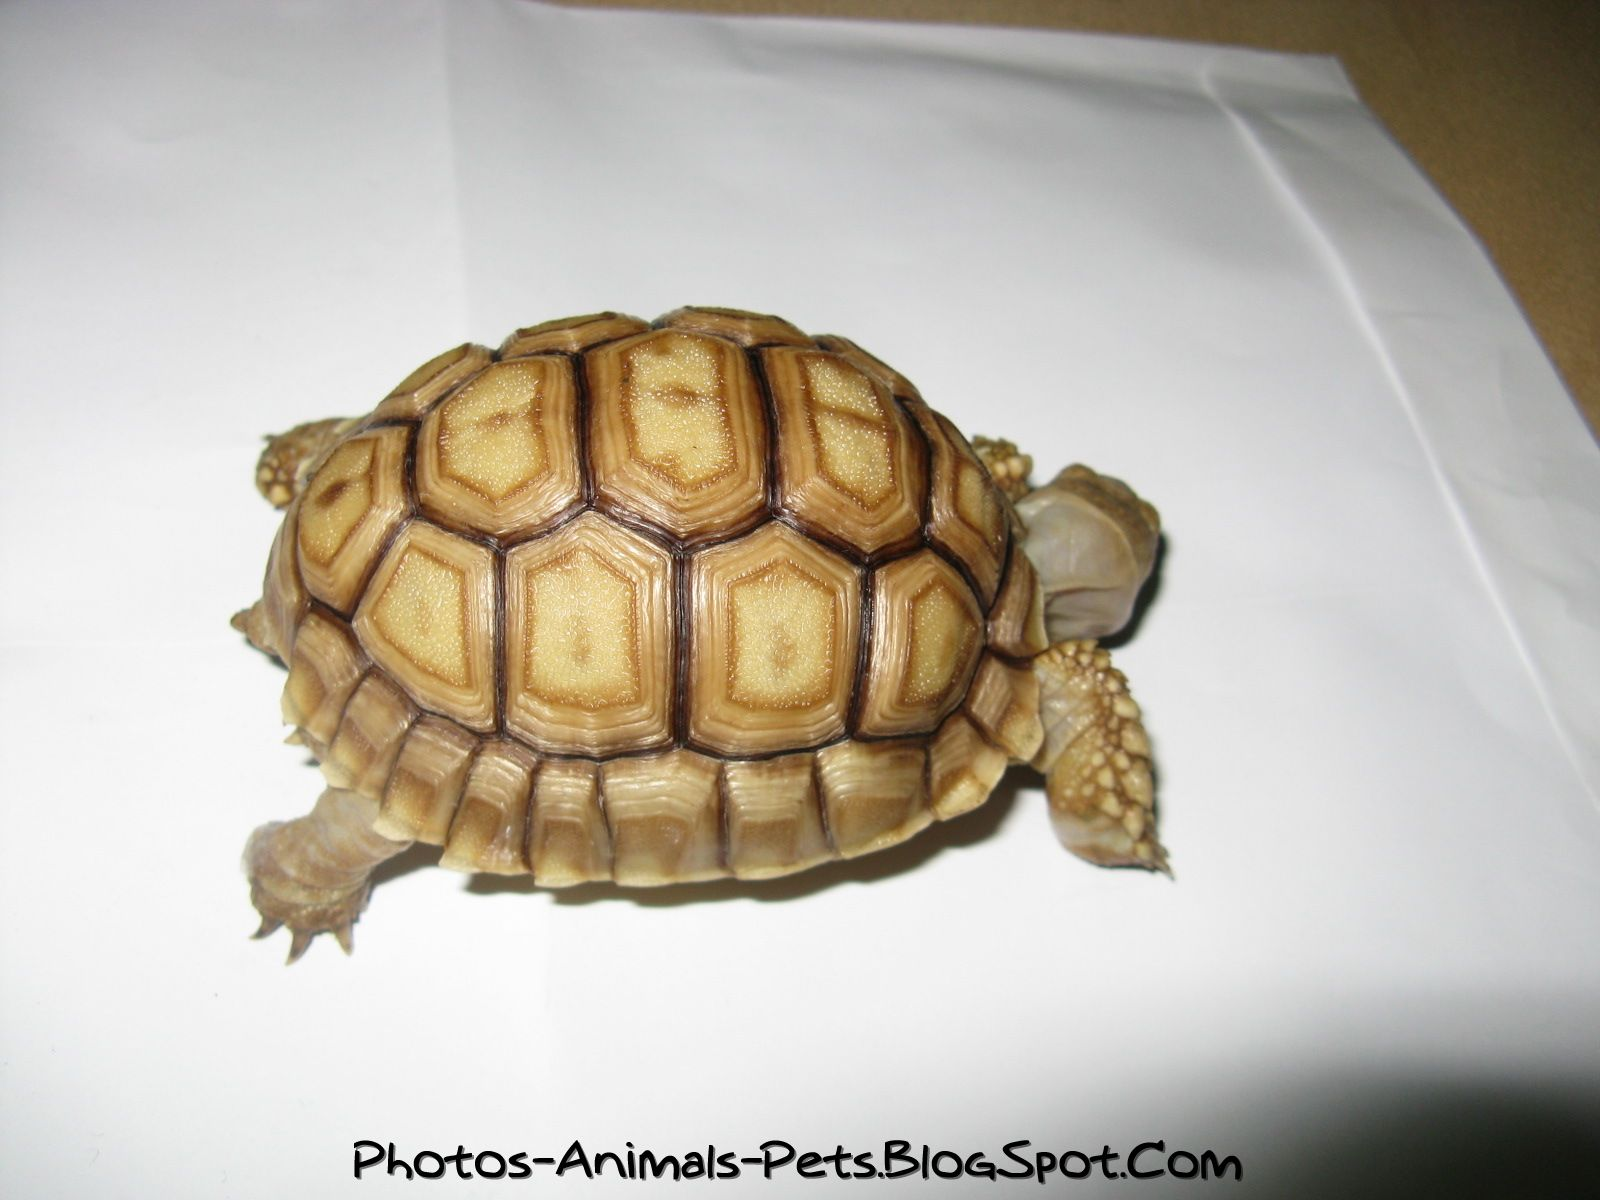 Cute baby turtles pictures Photos Animals PetsBlogSpotcom 1600x1200